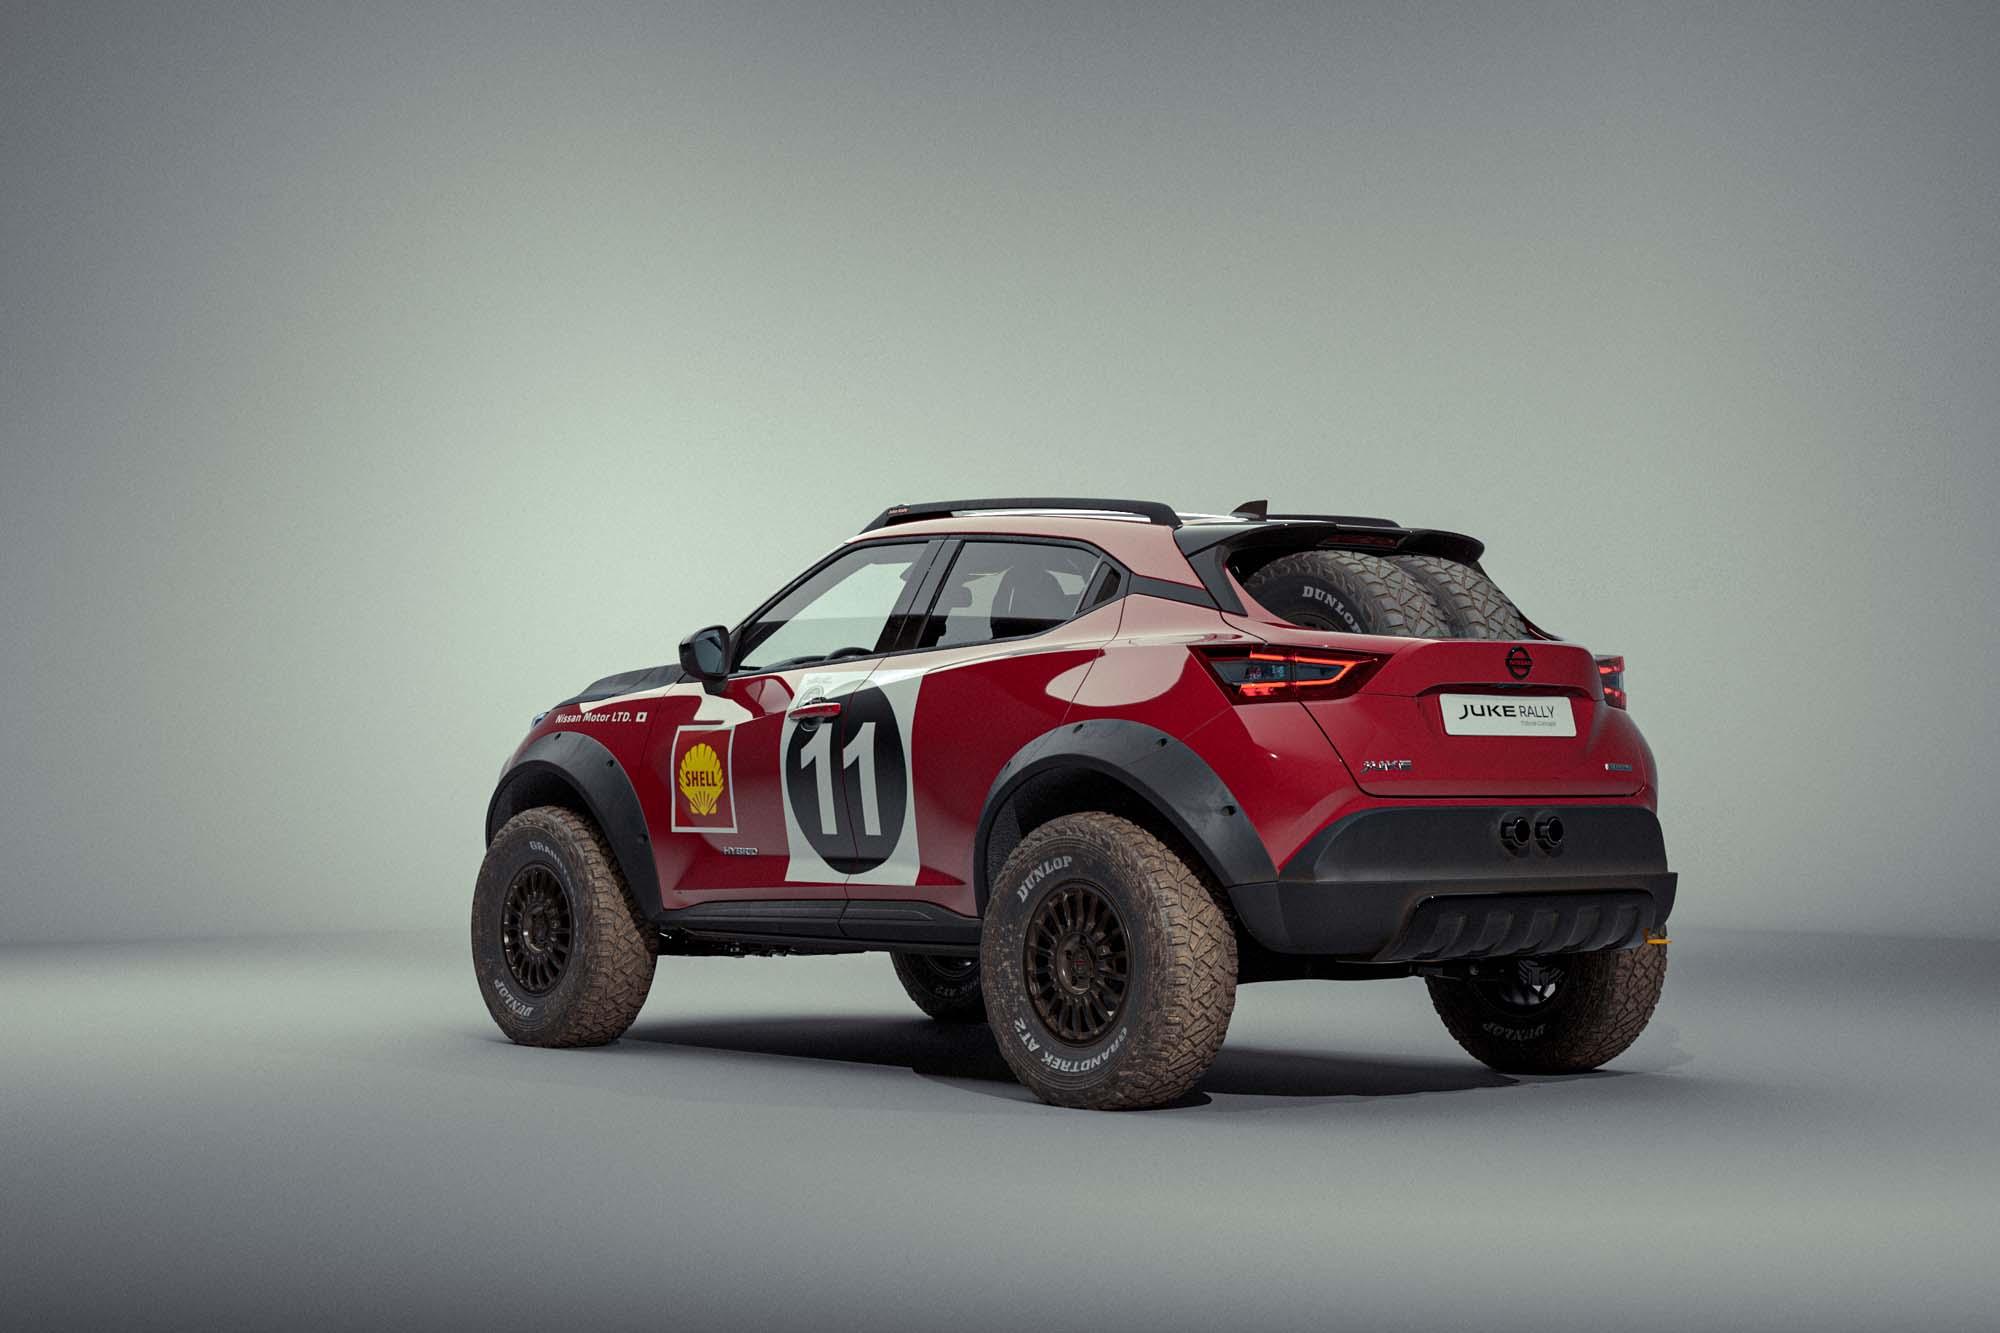 JUKE Rally Heritage Concept 2.JPG Πώς σου φαίνεται αυτό το Nissan Juke Rally; Nissan, Nissan Juke, zblog, ειδήσεις, Νέα